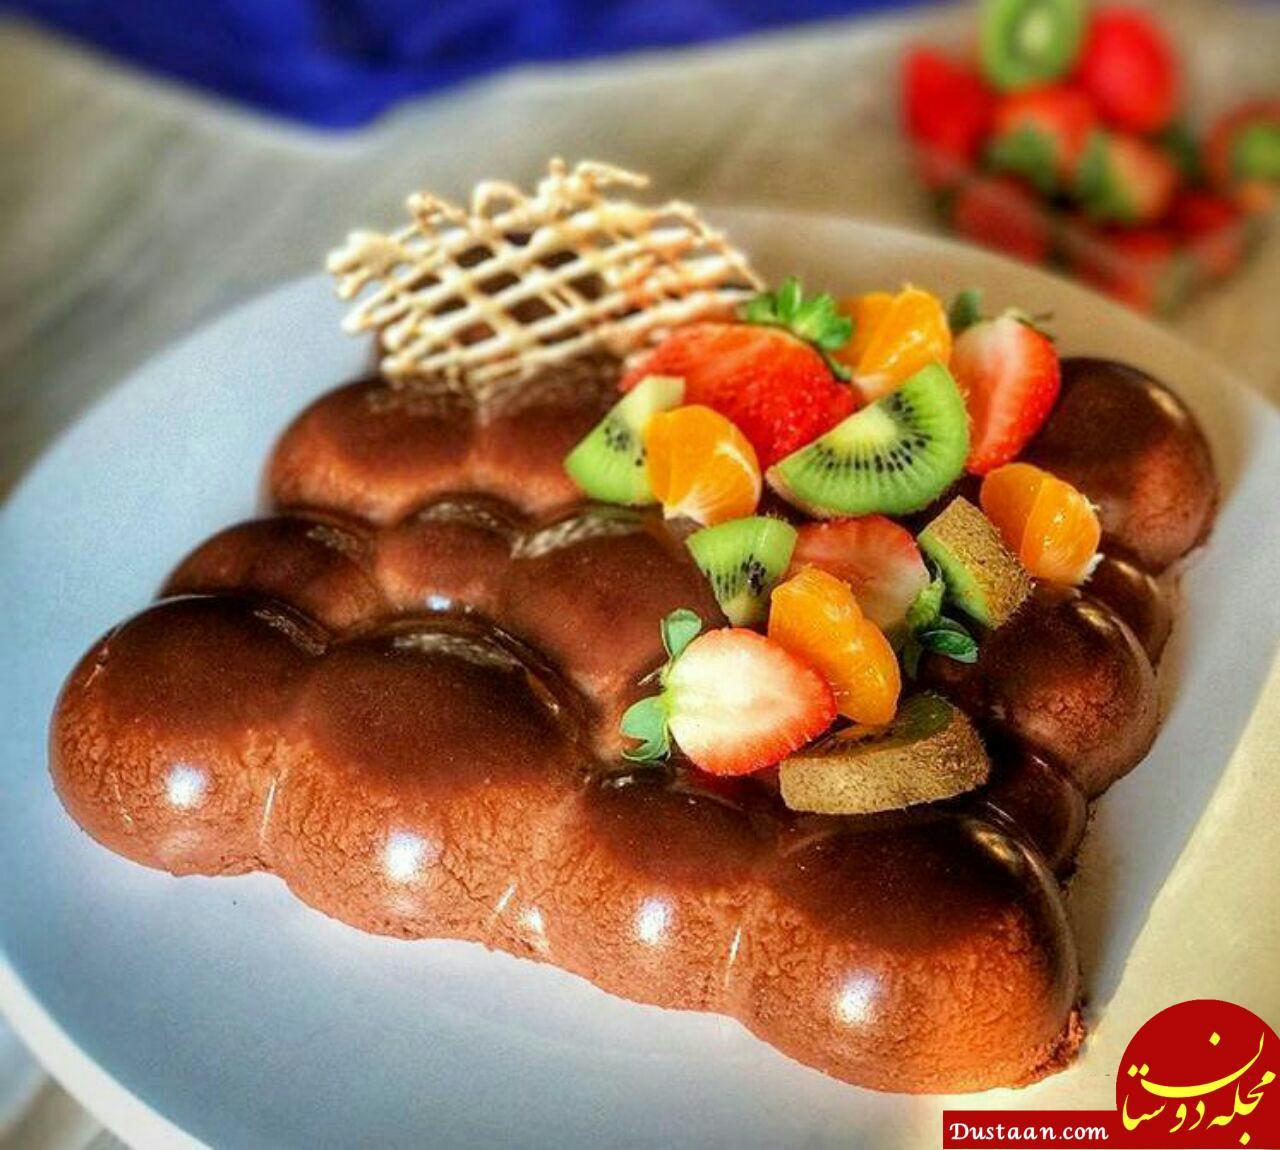 www.dustaan.com طرز تهیه موس شکلاتی به سبکی خوشمزه